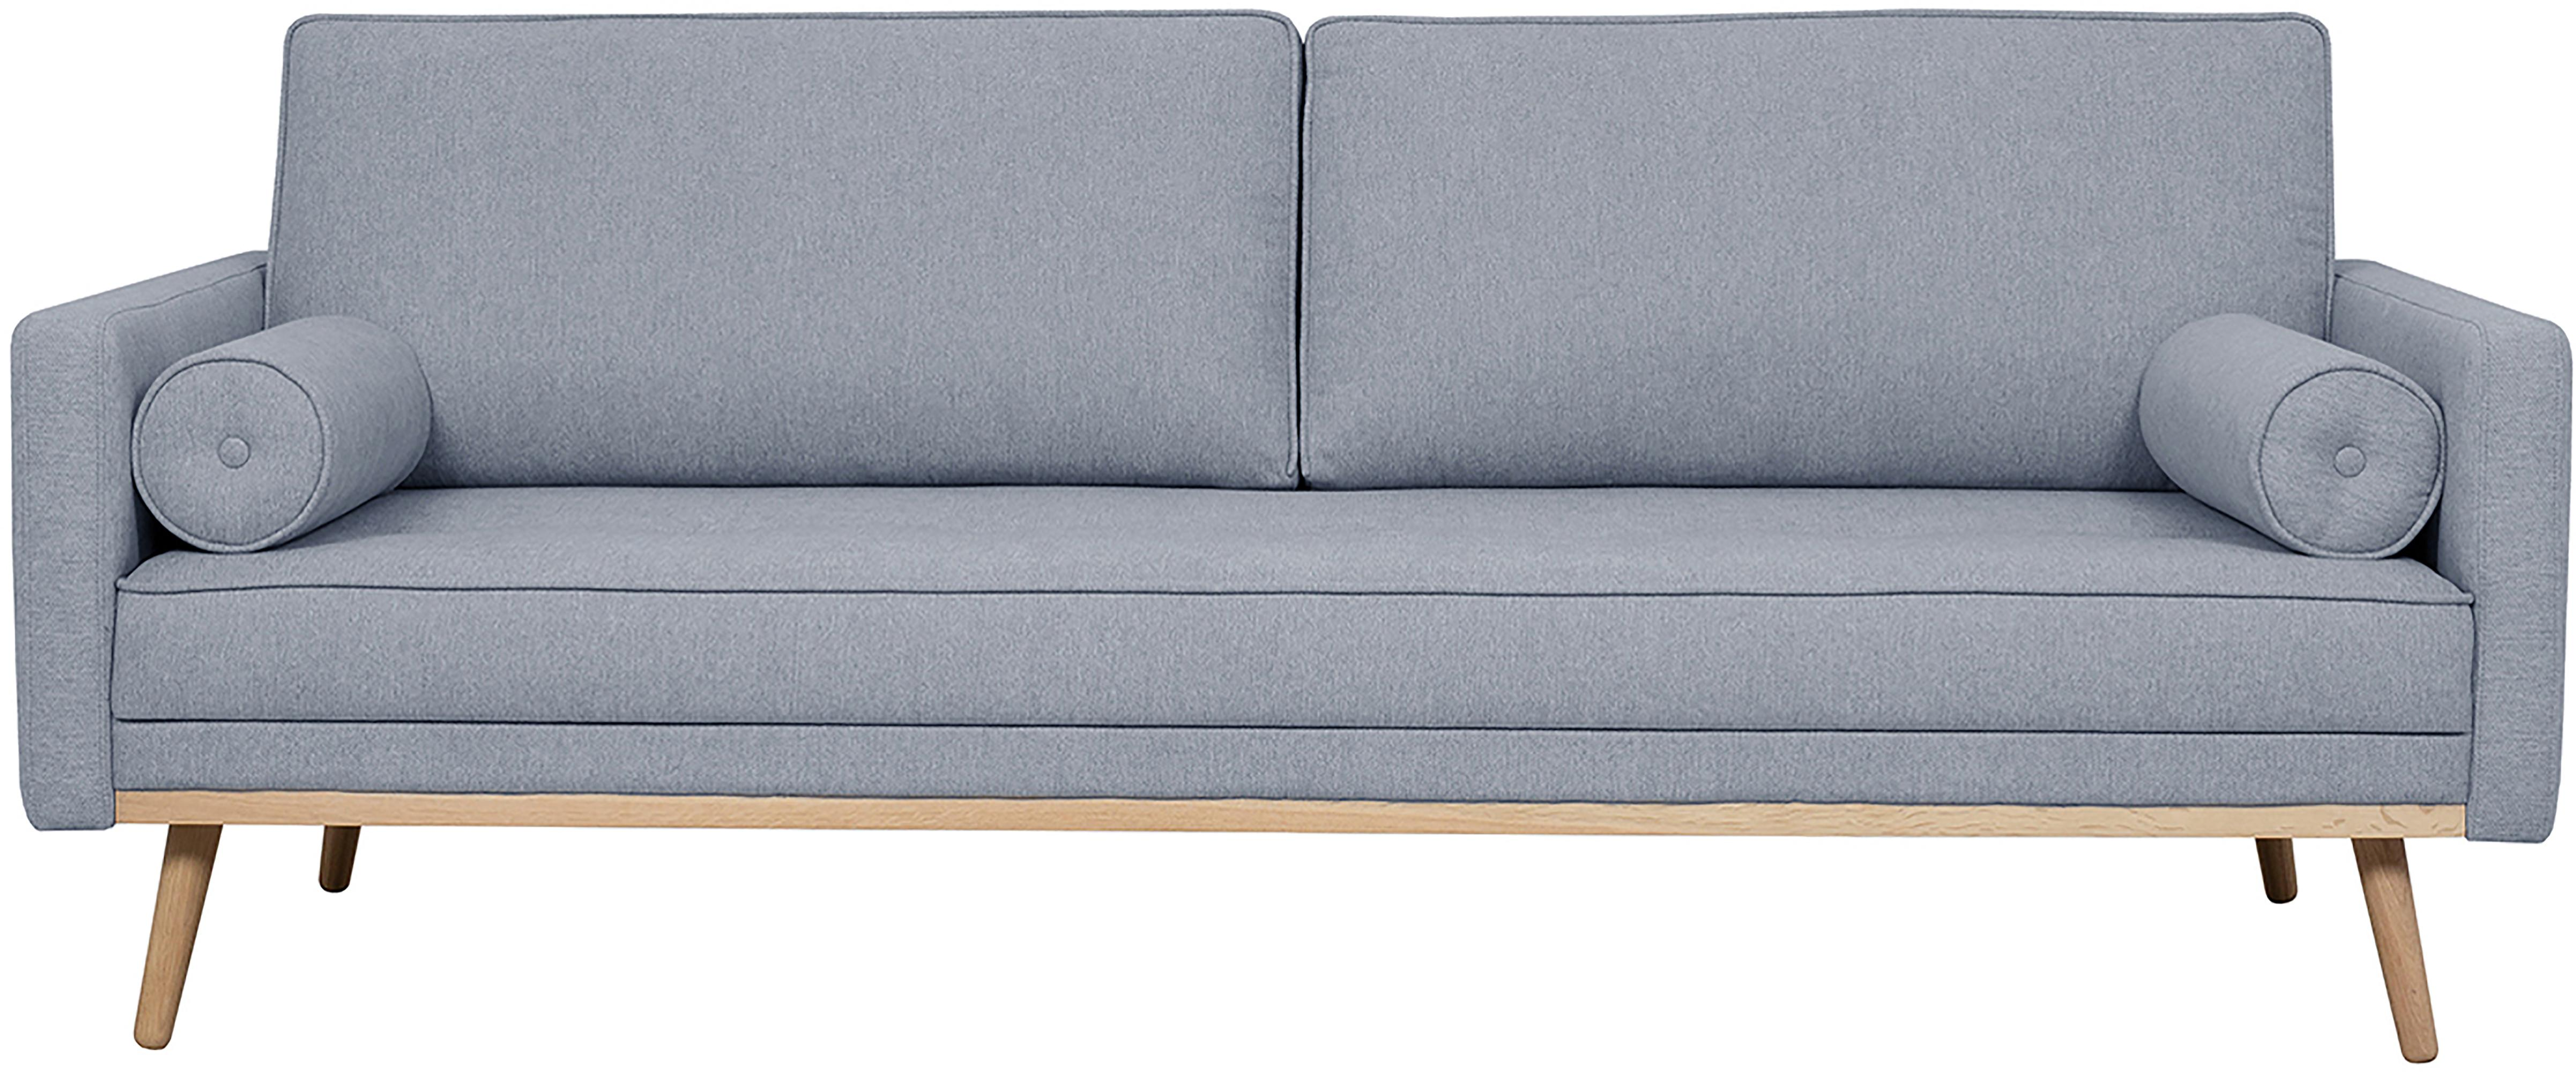 Sofa Saint (3-Sitzer), Bezug: Polyester Der hochwertige, Gestell: Massives Kiefernholz, Spa, Webstoff Blaugrau, 210 x 70 cm